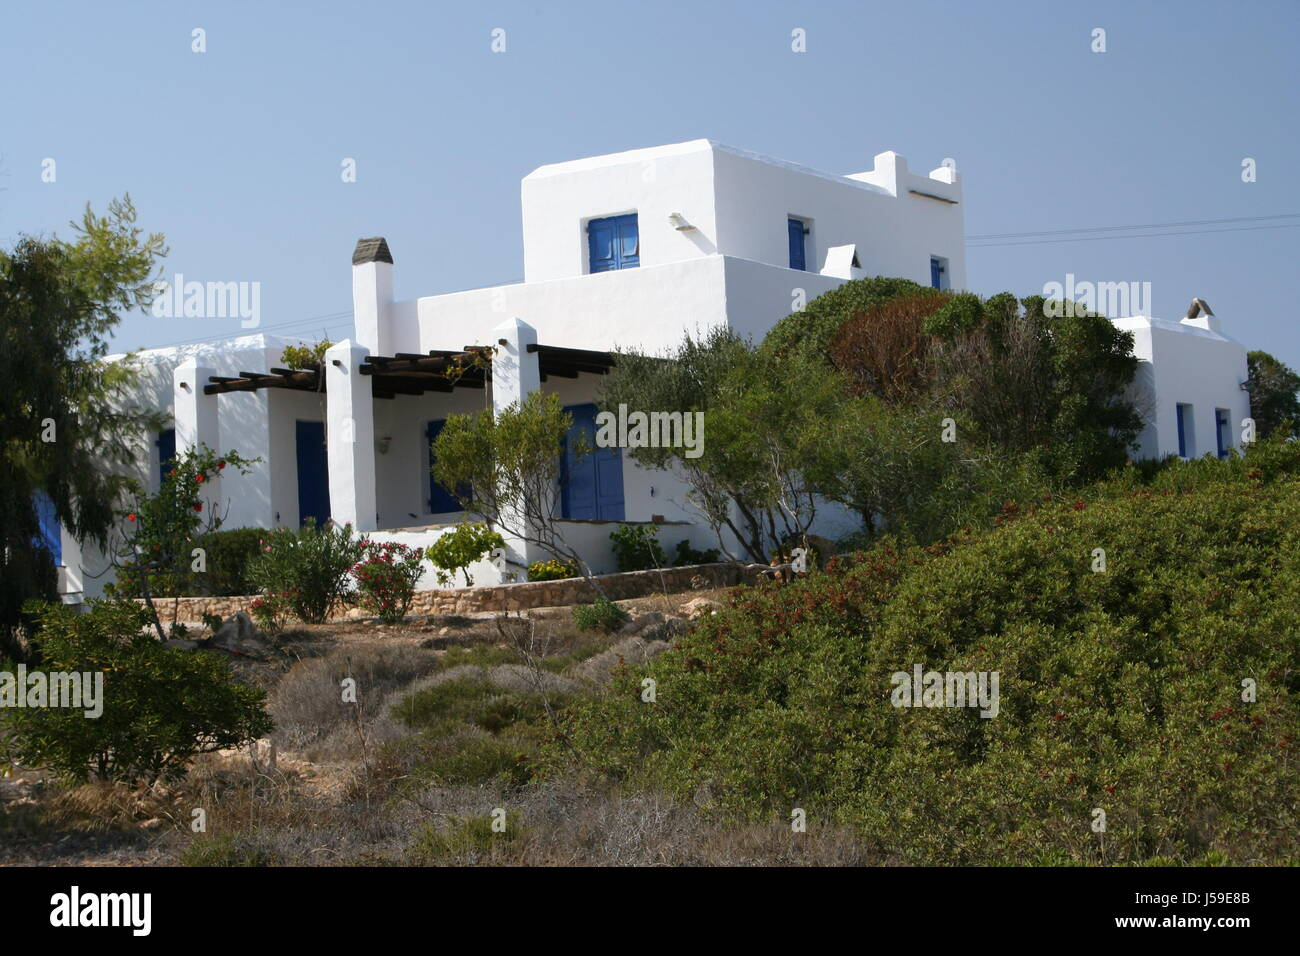 Greece New Building Stil Blaue Tren Weie Wnde Weier Stock Image With Weie